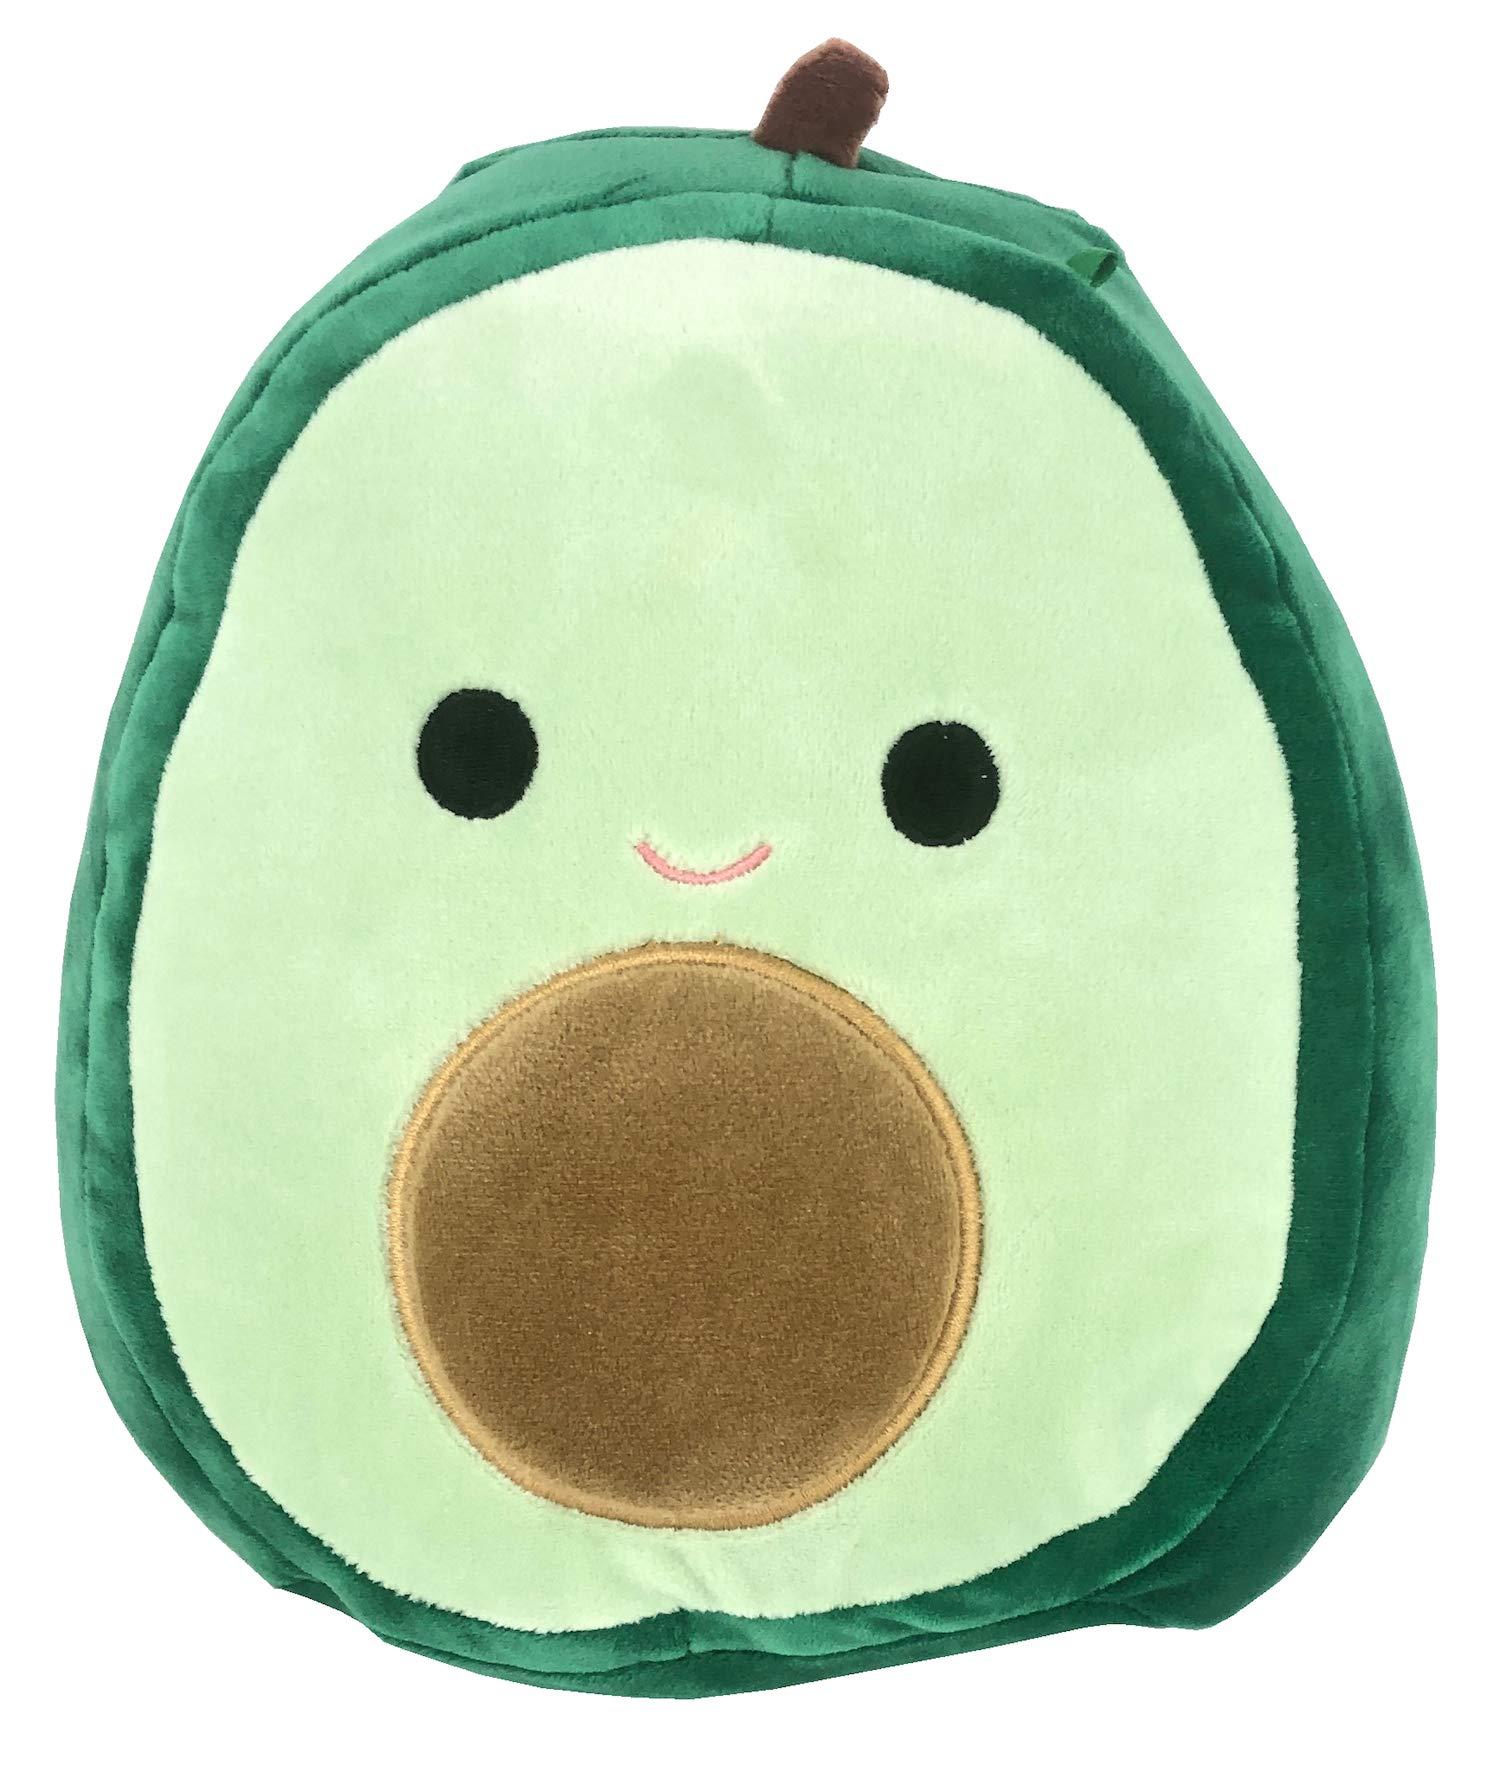 SQUISHMALLOWS - Austin The Avocado - Plush Stuffed Animal Figure - 9 Inch